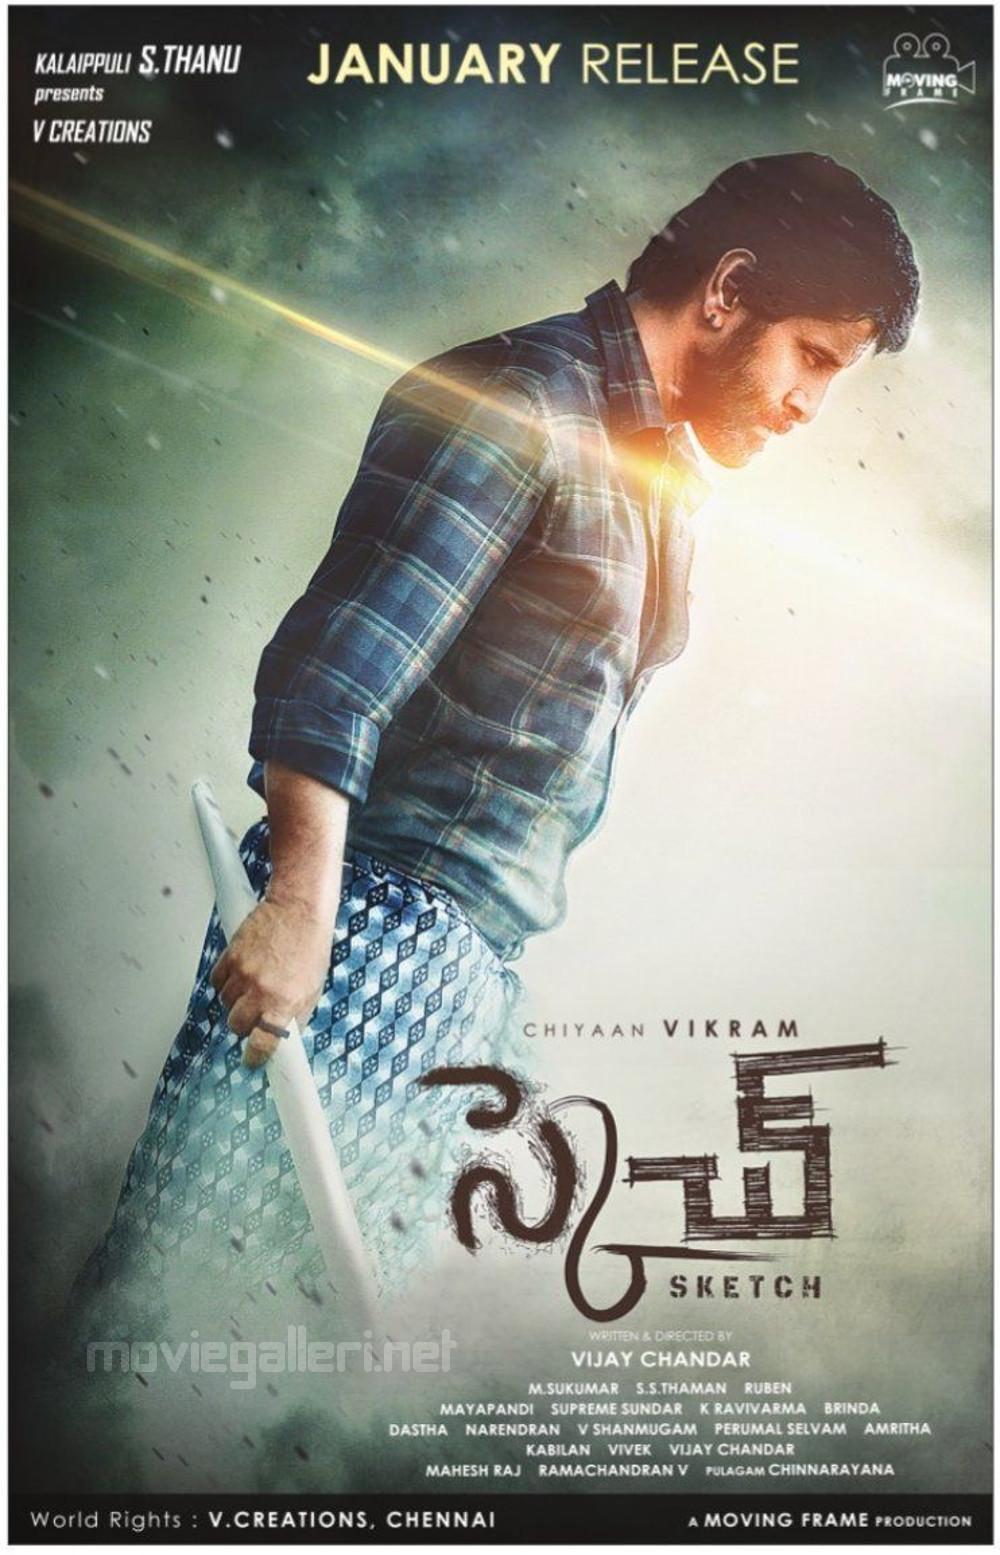 Vijay Cute Wallpapers Tamanna Vikram Sketch Movie January Release Poster New